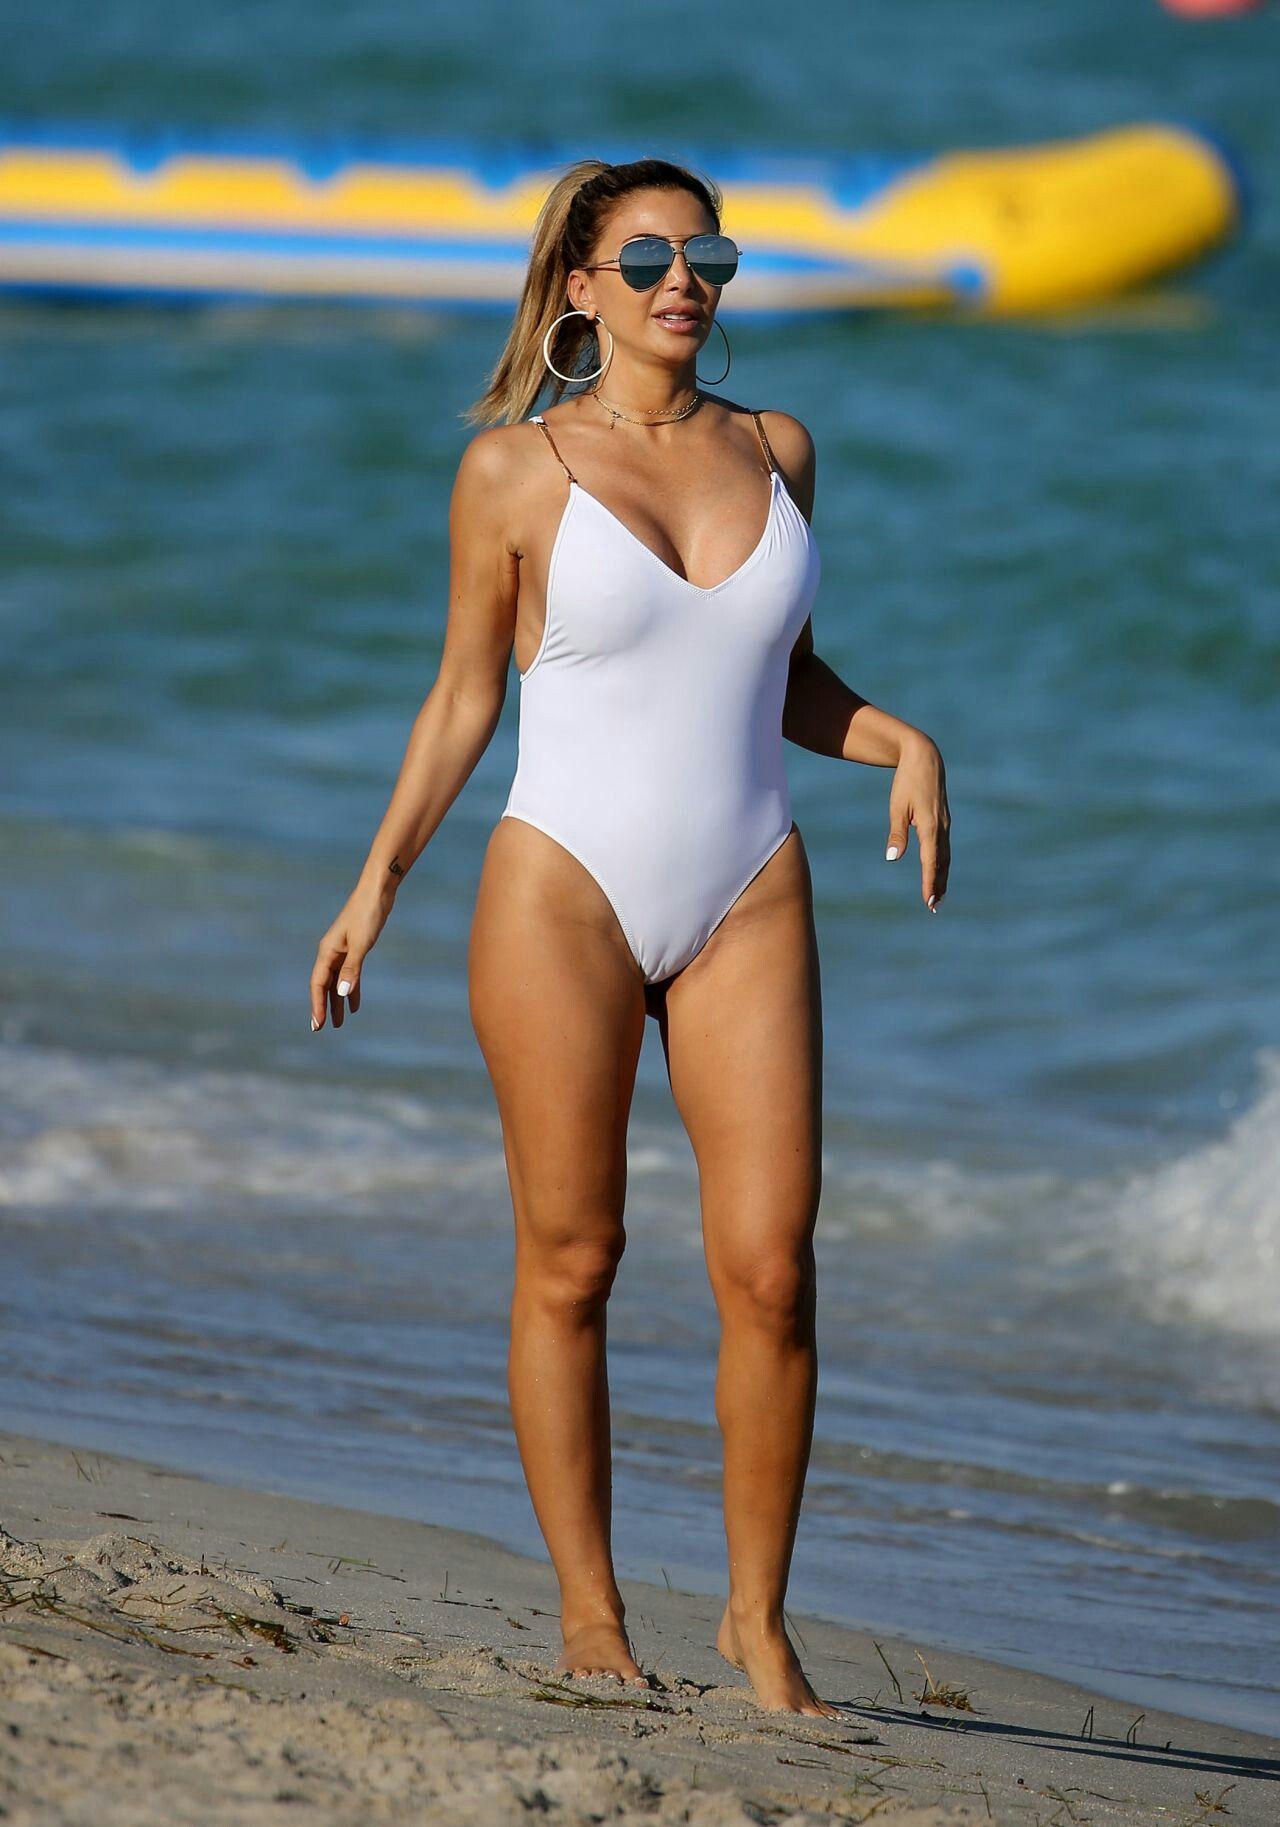 camel toe swimsuit